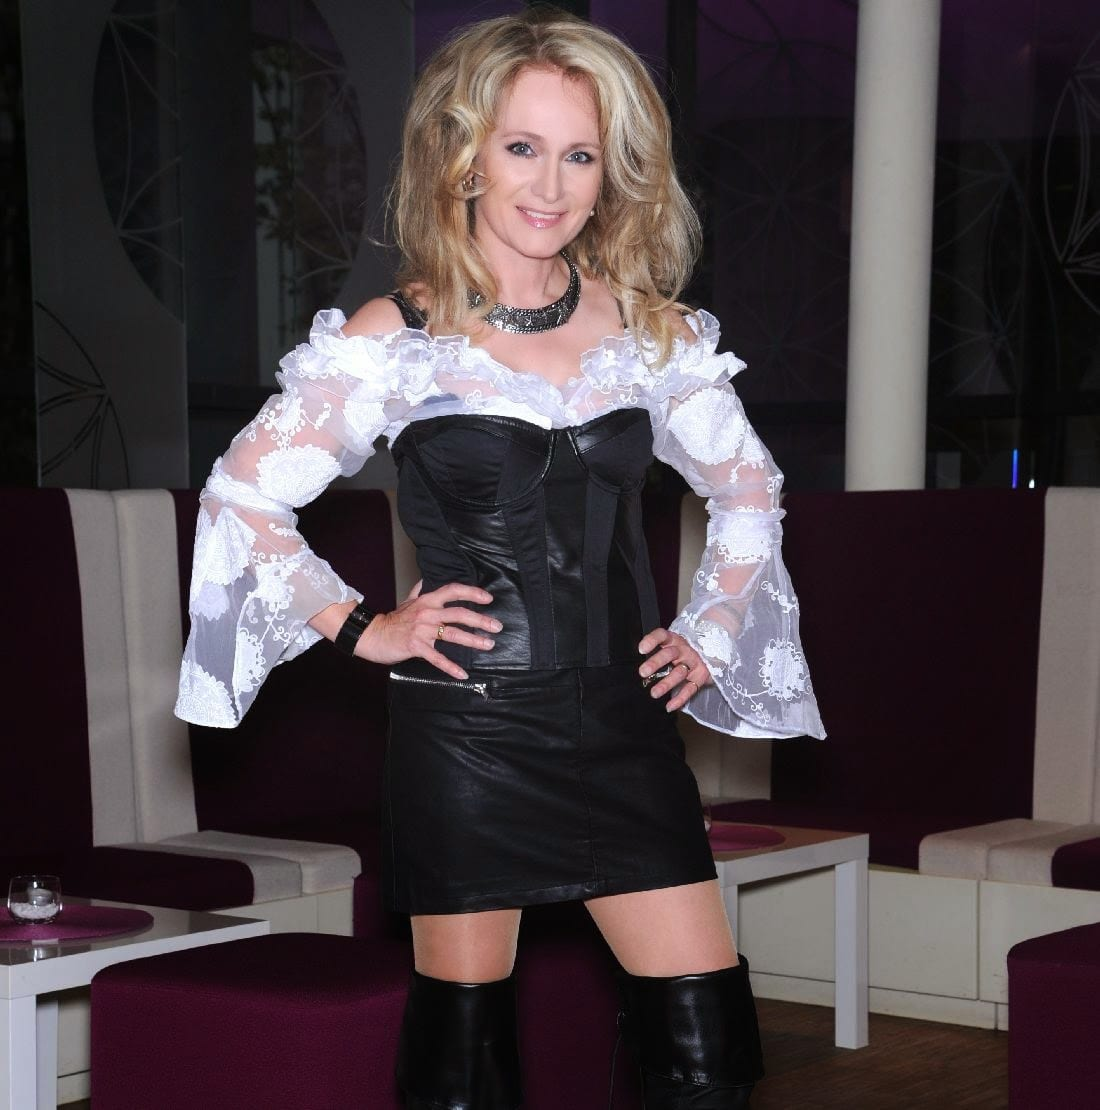 Nicole Hohloch